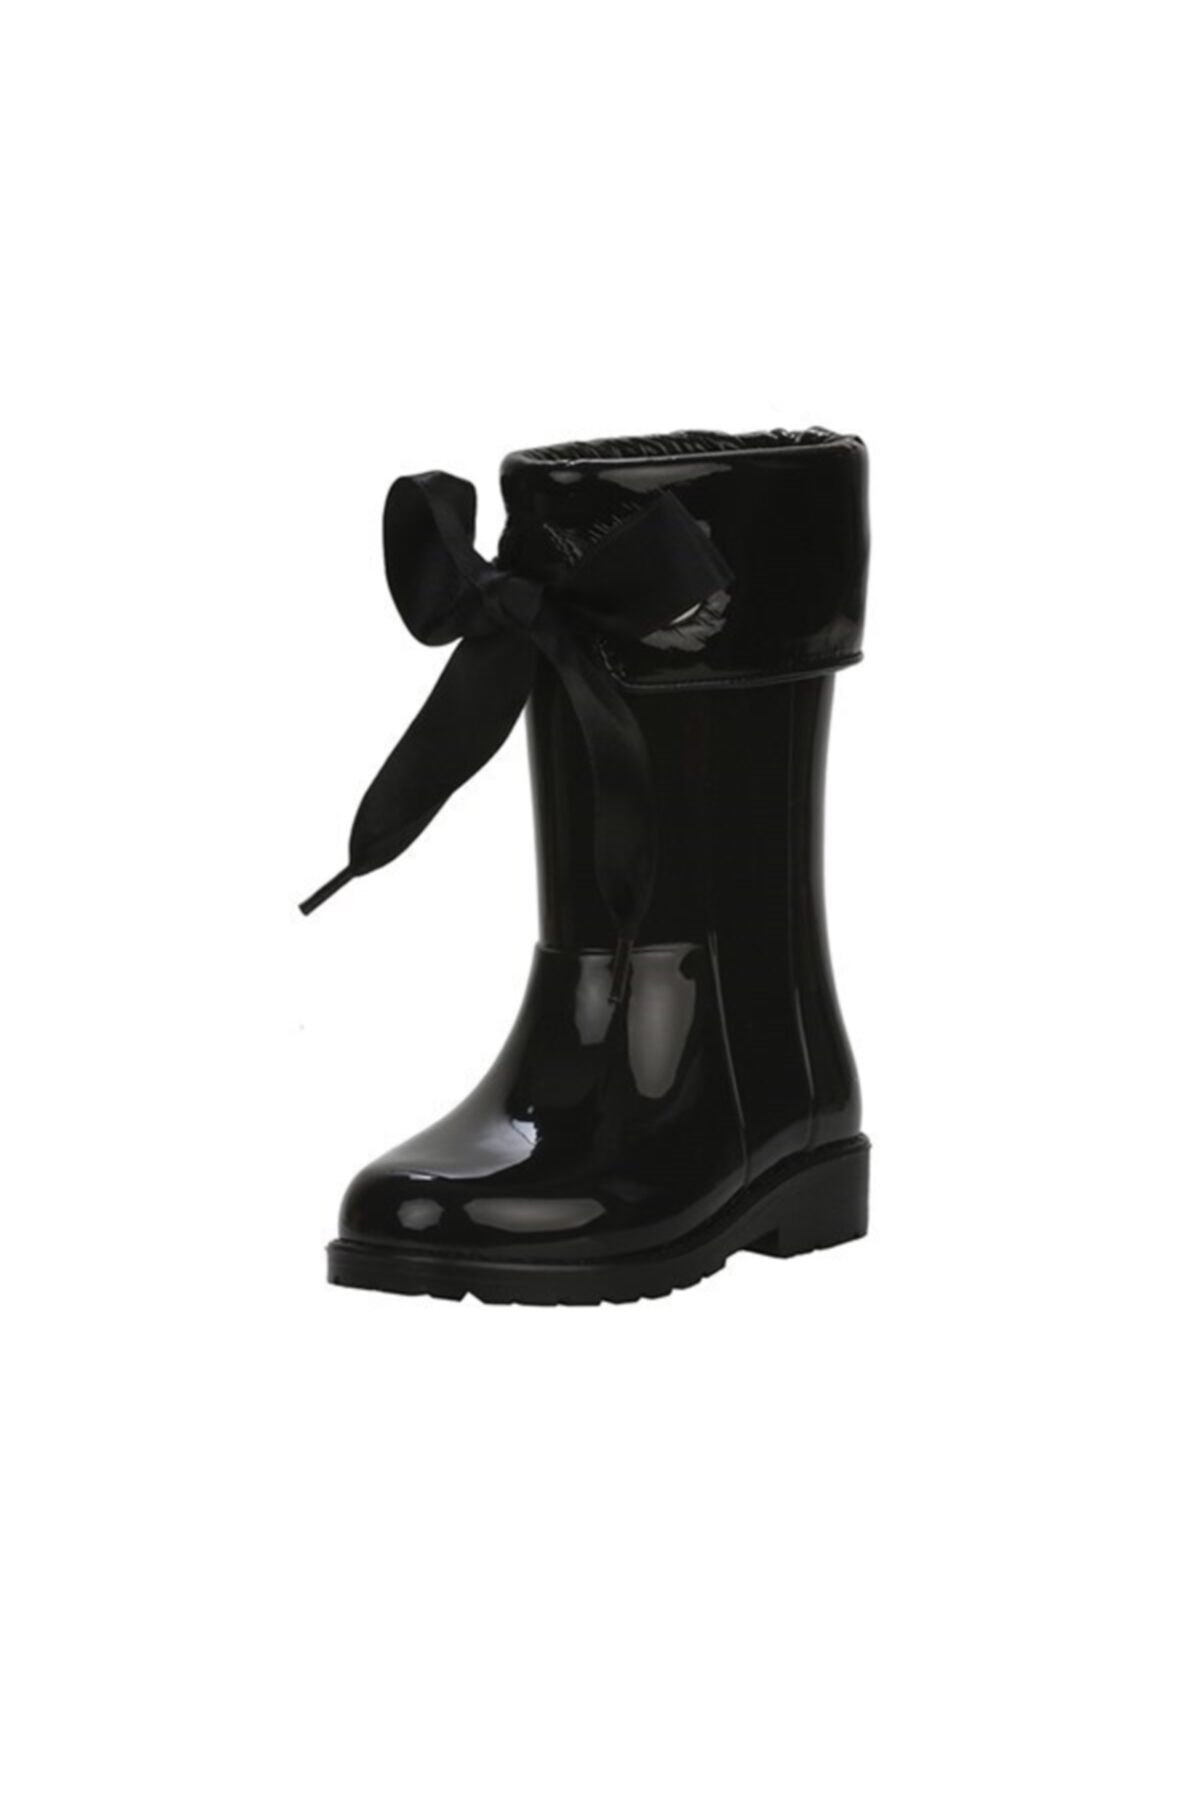 IGOR Campera Charol Yağmur Çizmesi - Siyah 2